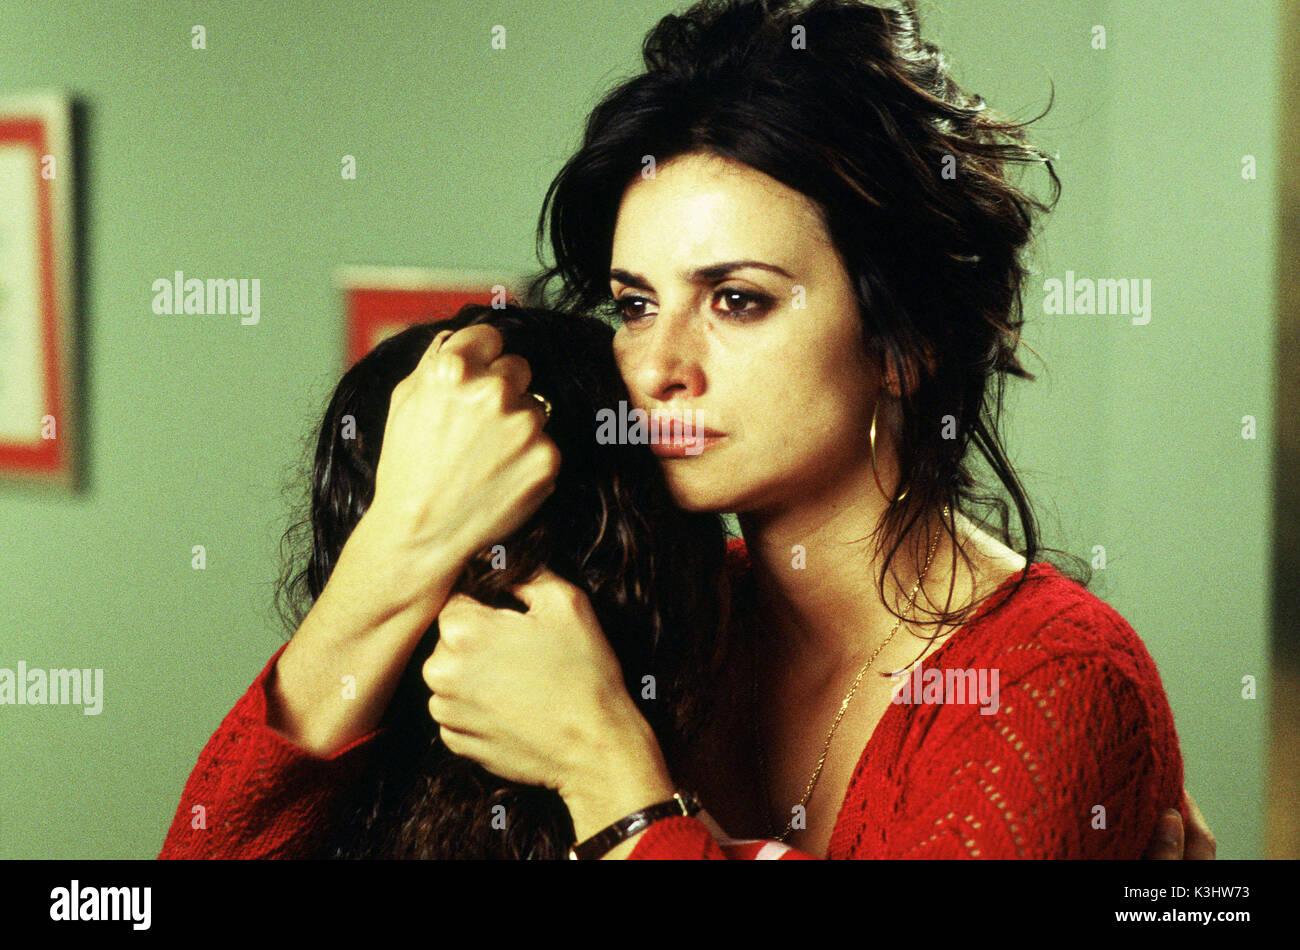 Yohana Cobo Volver - 2006 720/1080 new pics